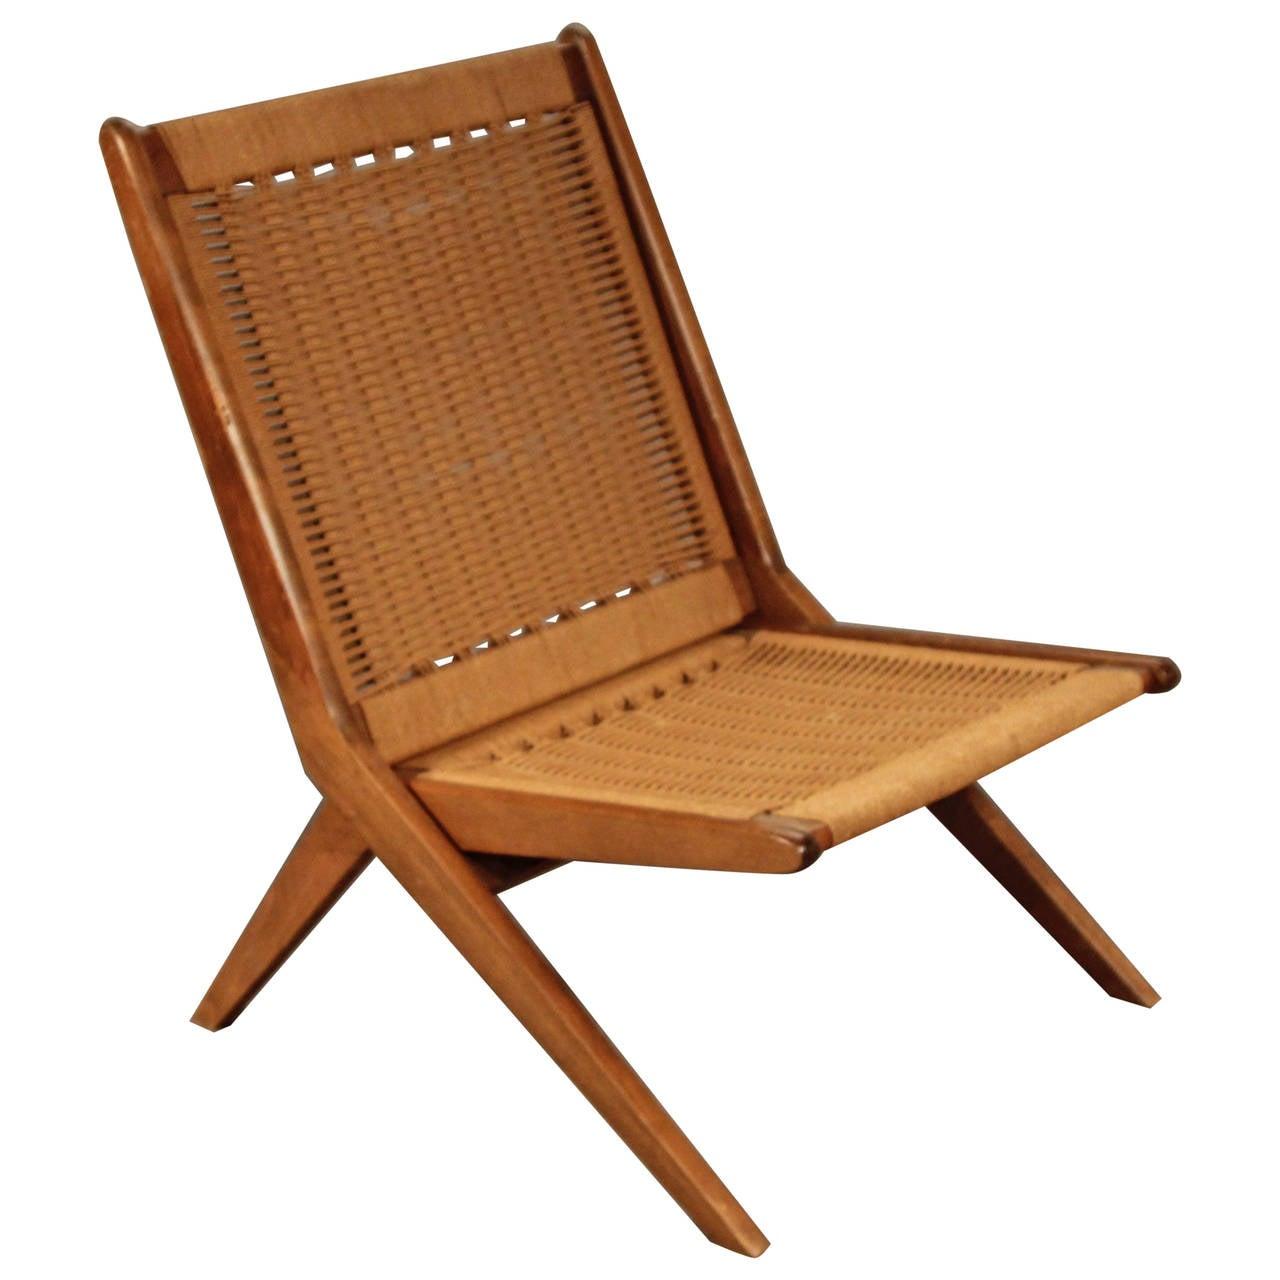 Hans Wegner Style Folding Rope Chair At 1stdibs